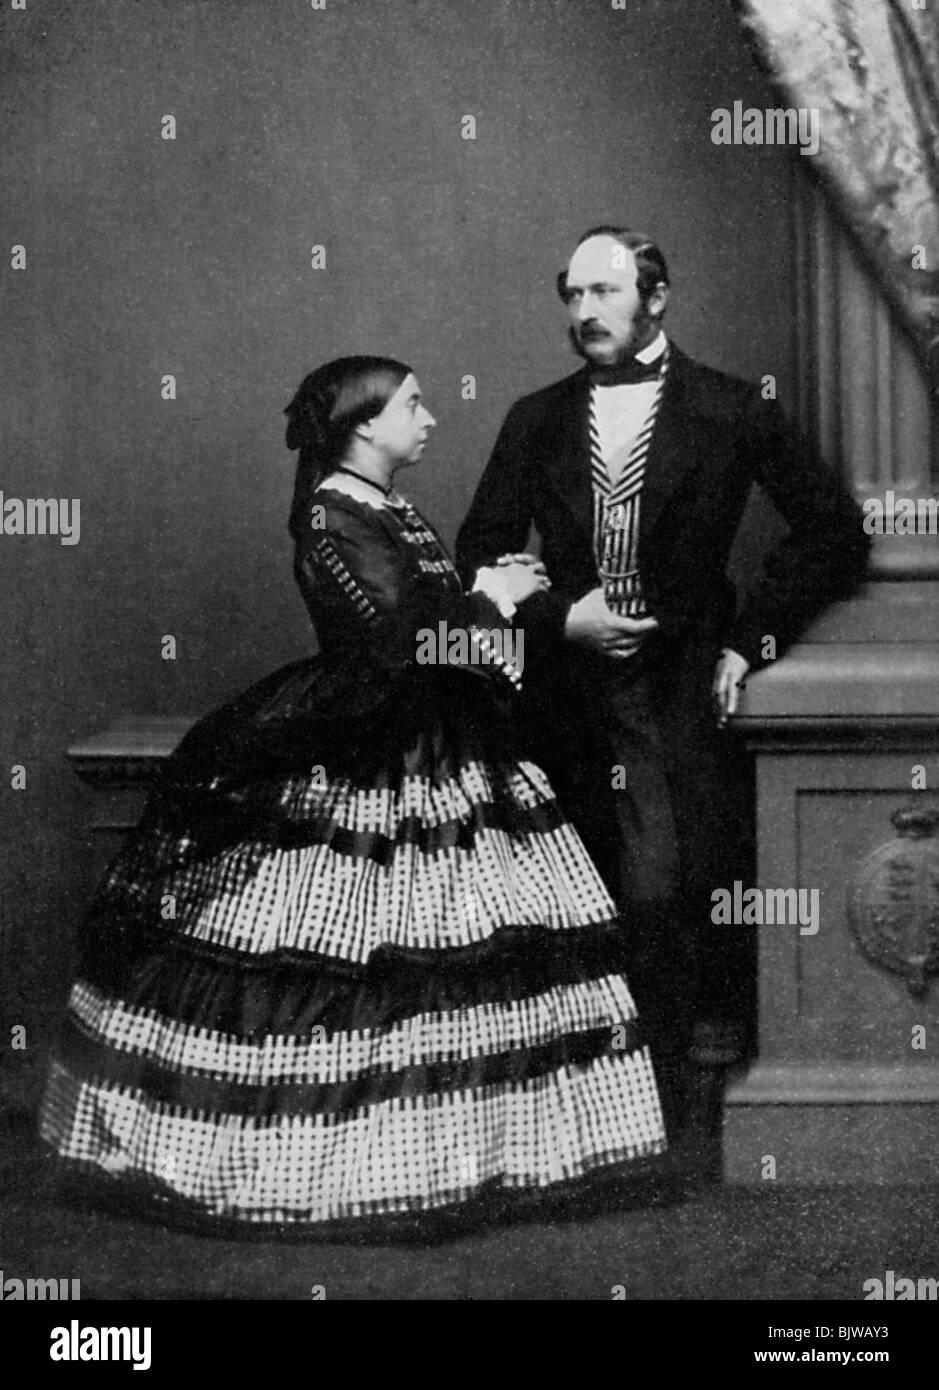 Queen Victoria and Albert, Prince Consort, 1861 (1964). - Stock Image